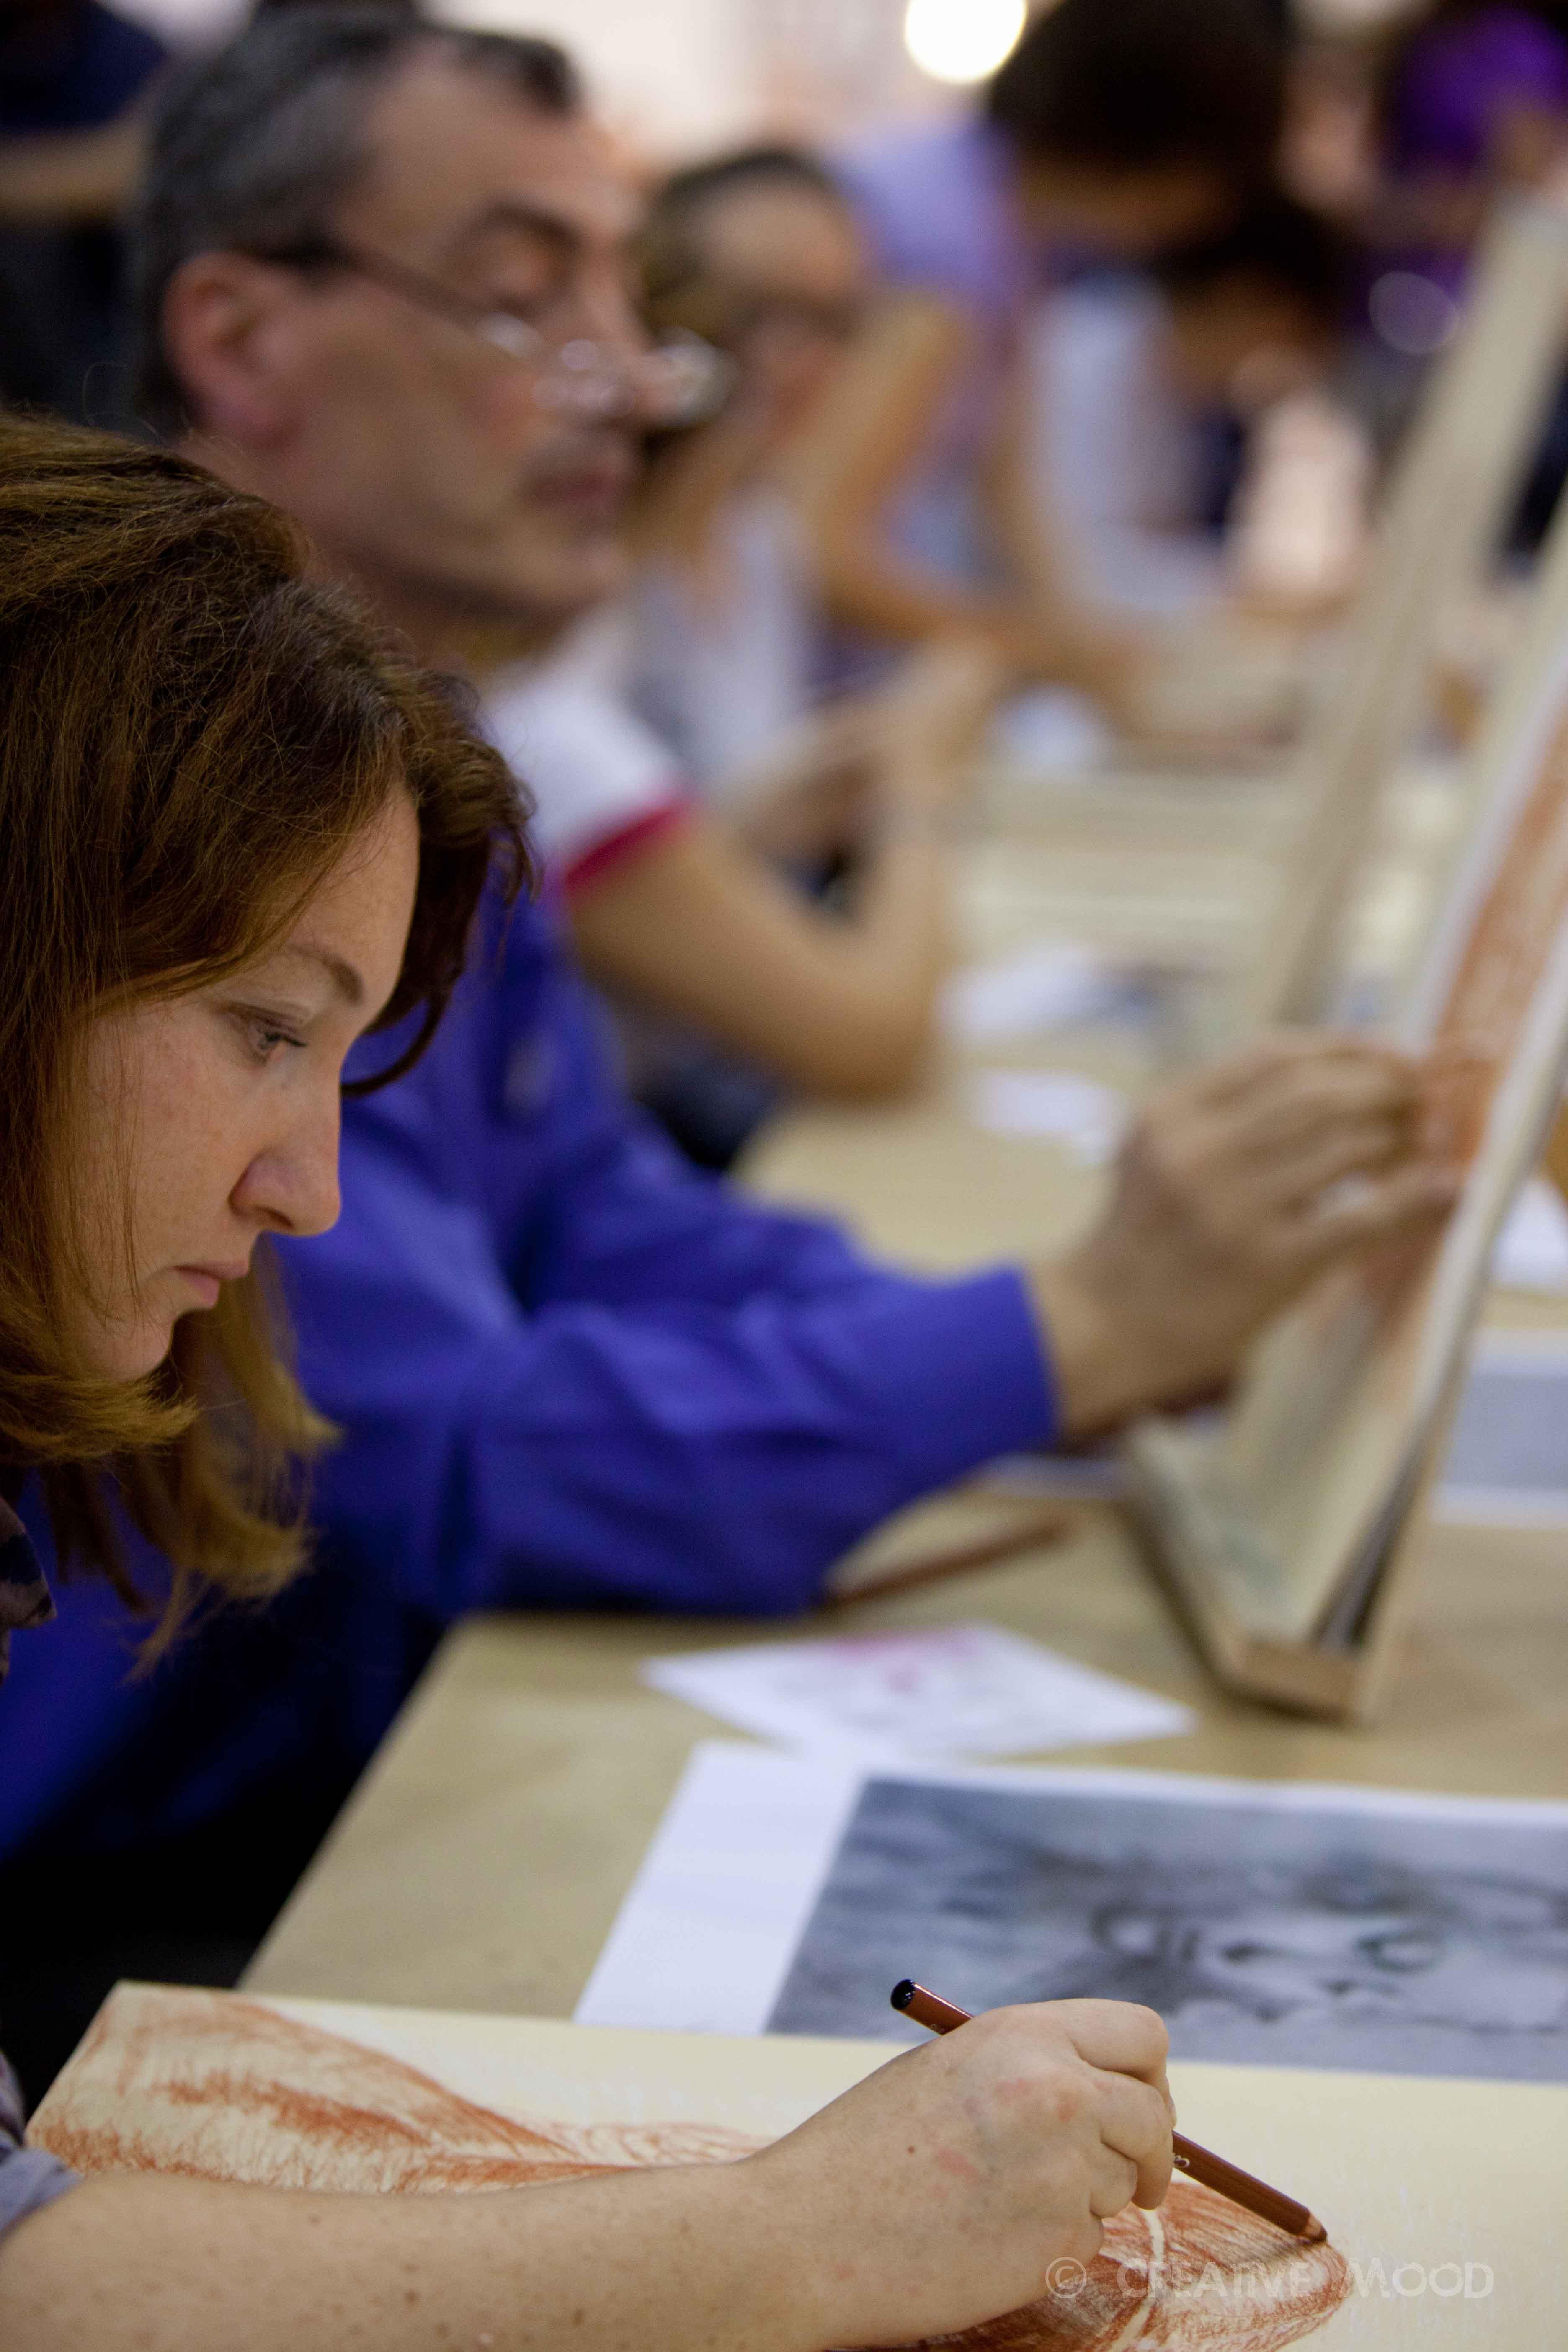 officina d'arte Hobby show fiera di roma-42.jpg